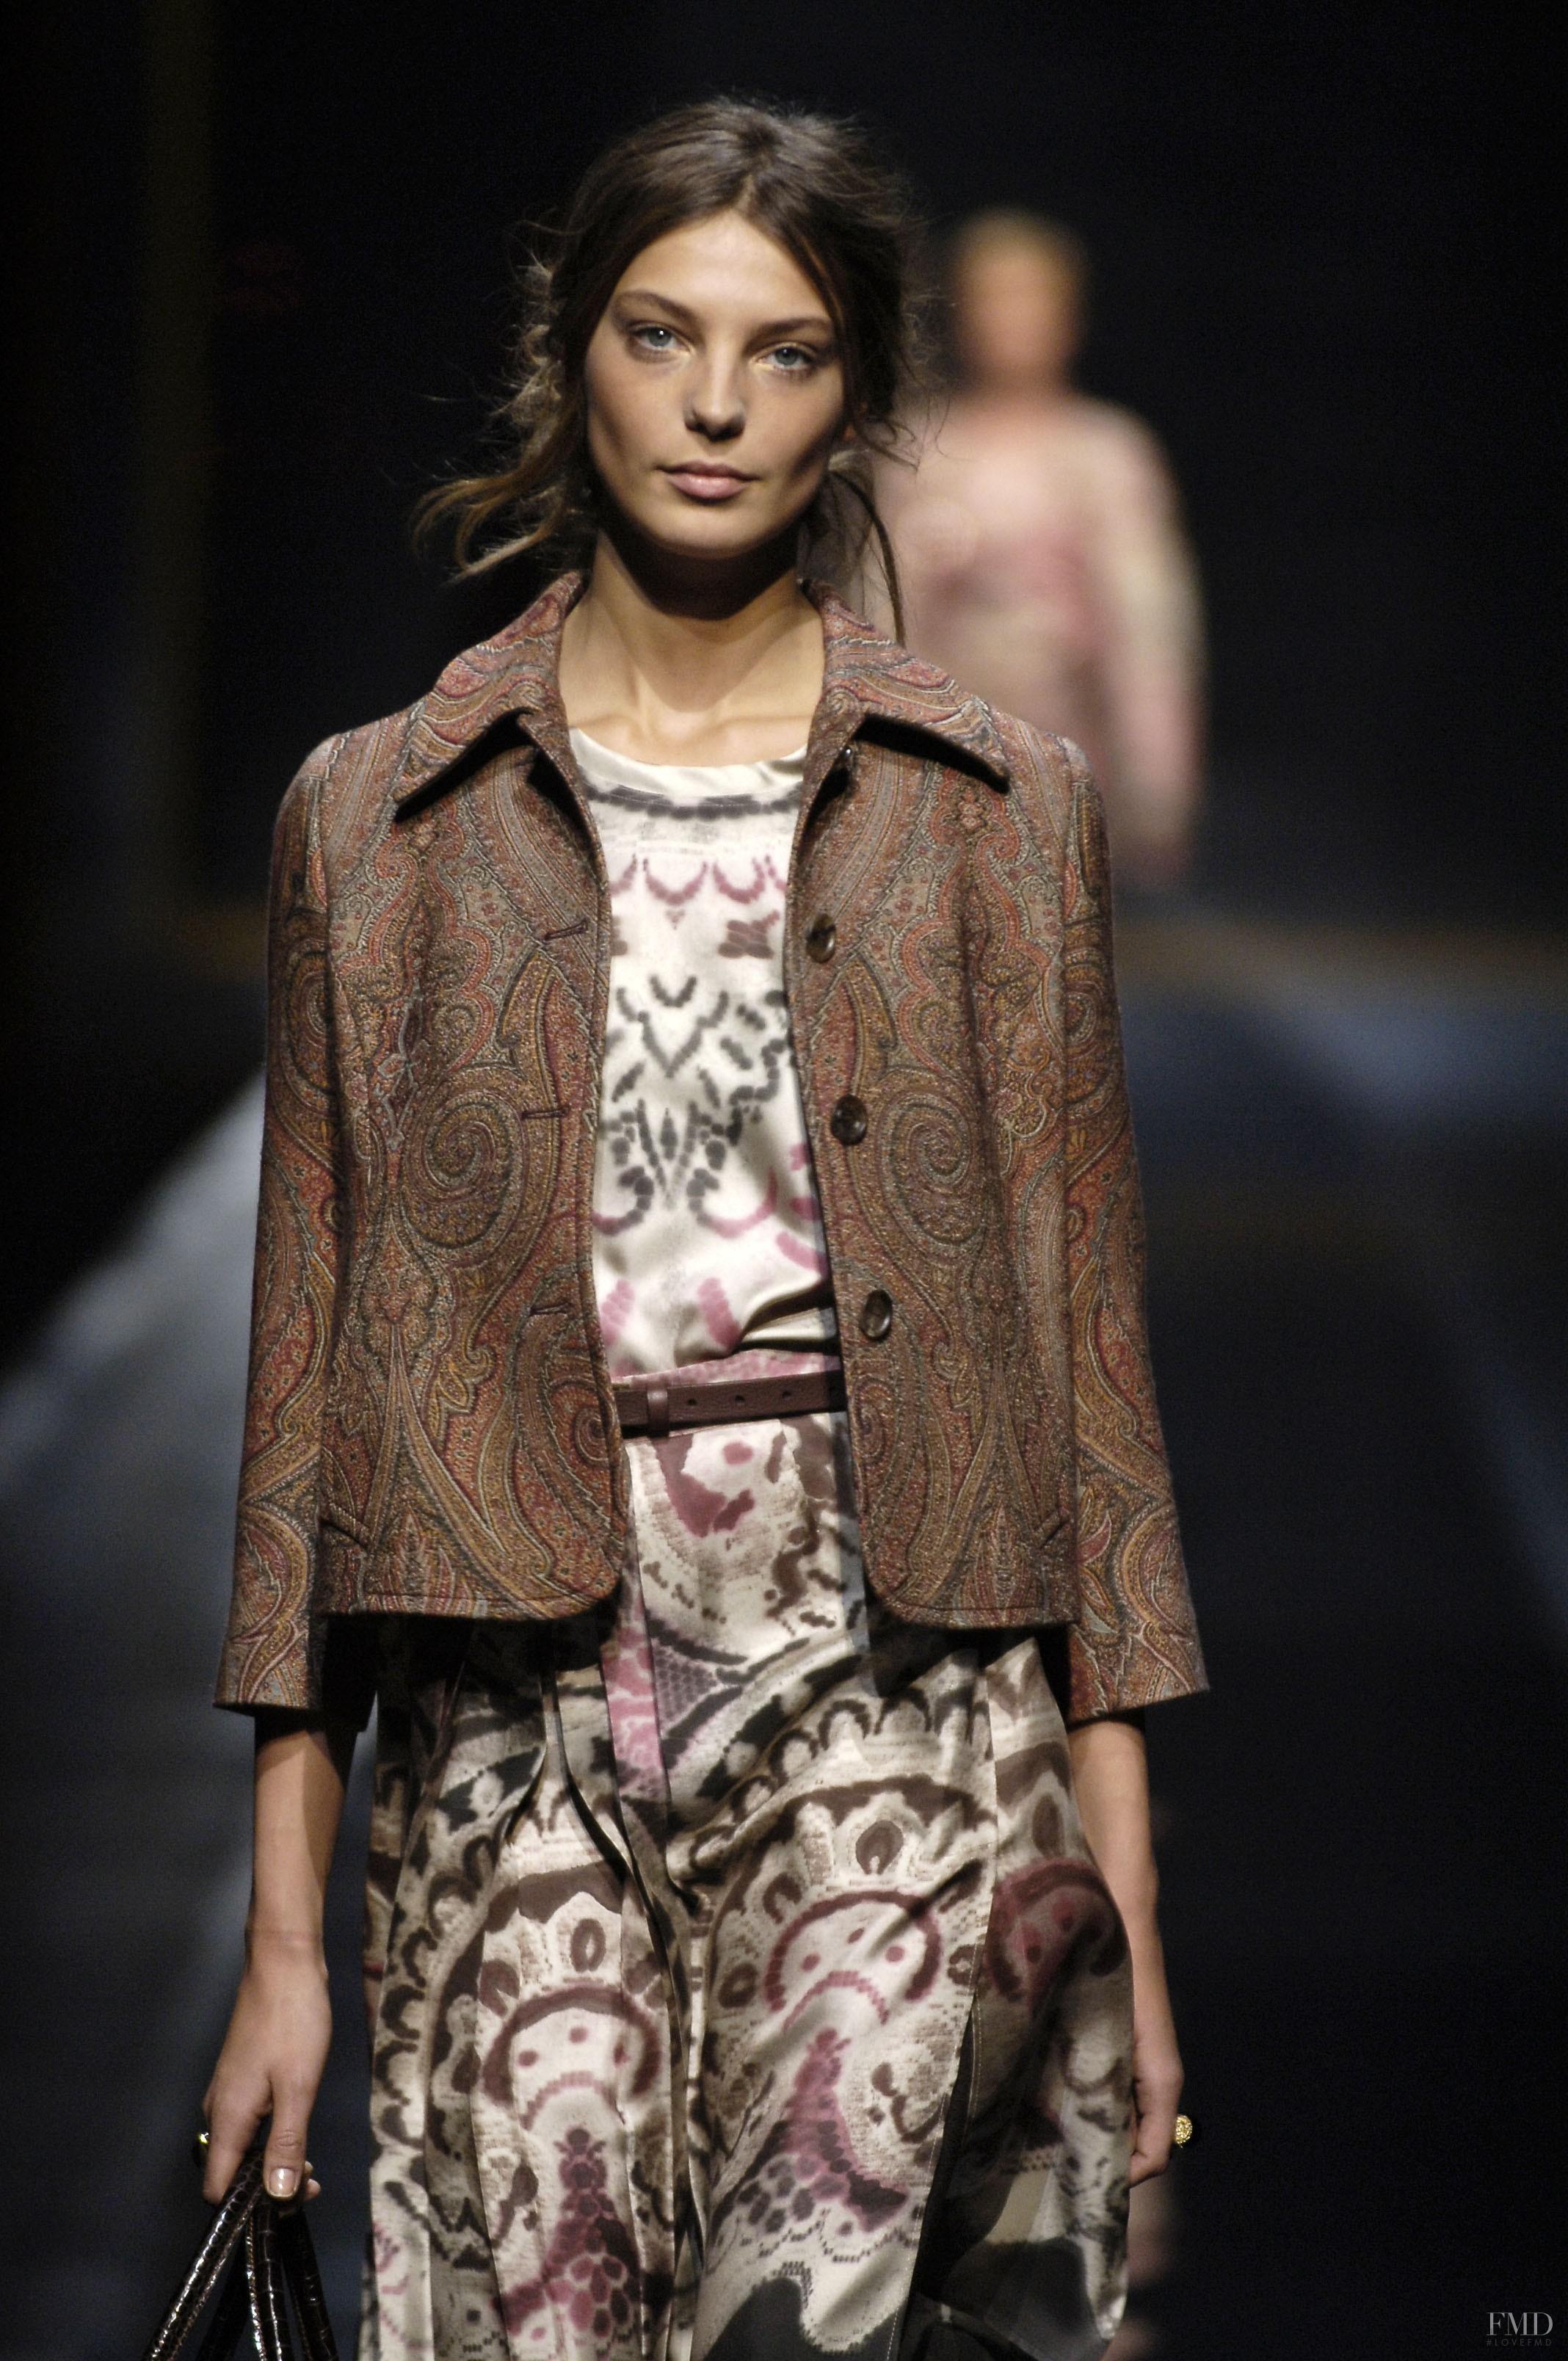 2007 Fashion Trends - Major New Fashion Looks Autumn 2006 Autumn winter 2006 fashion